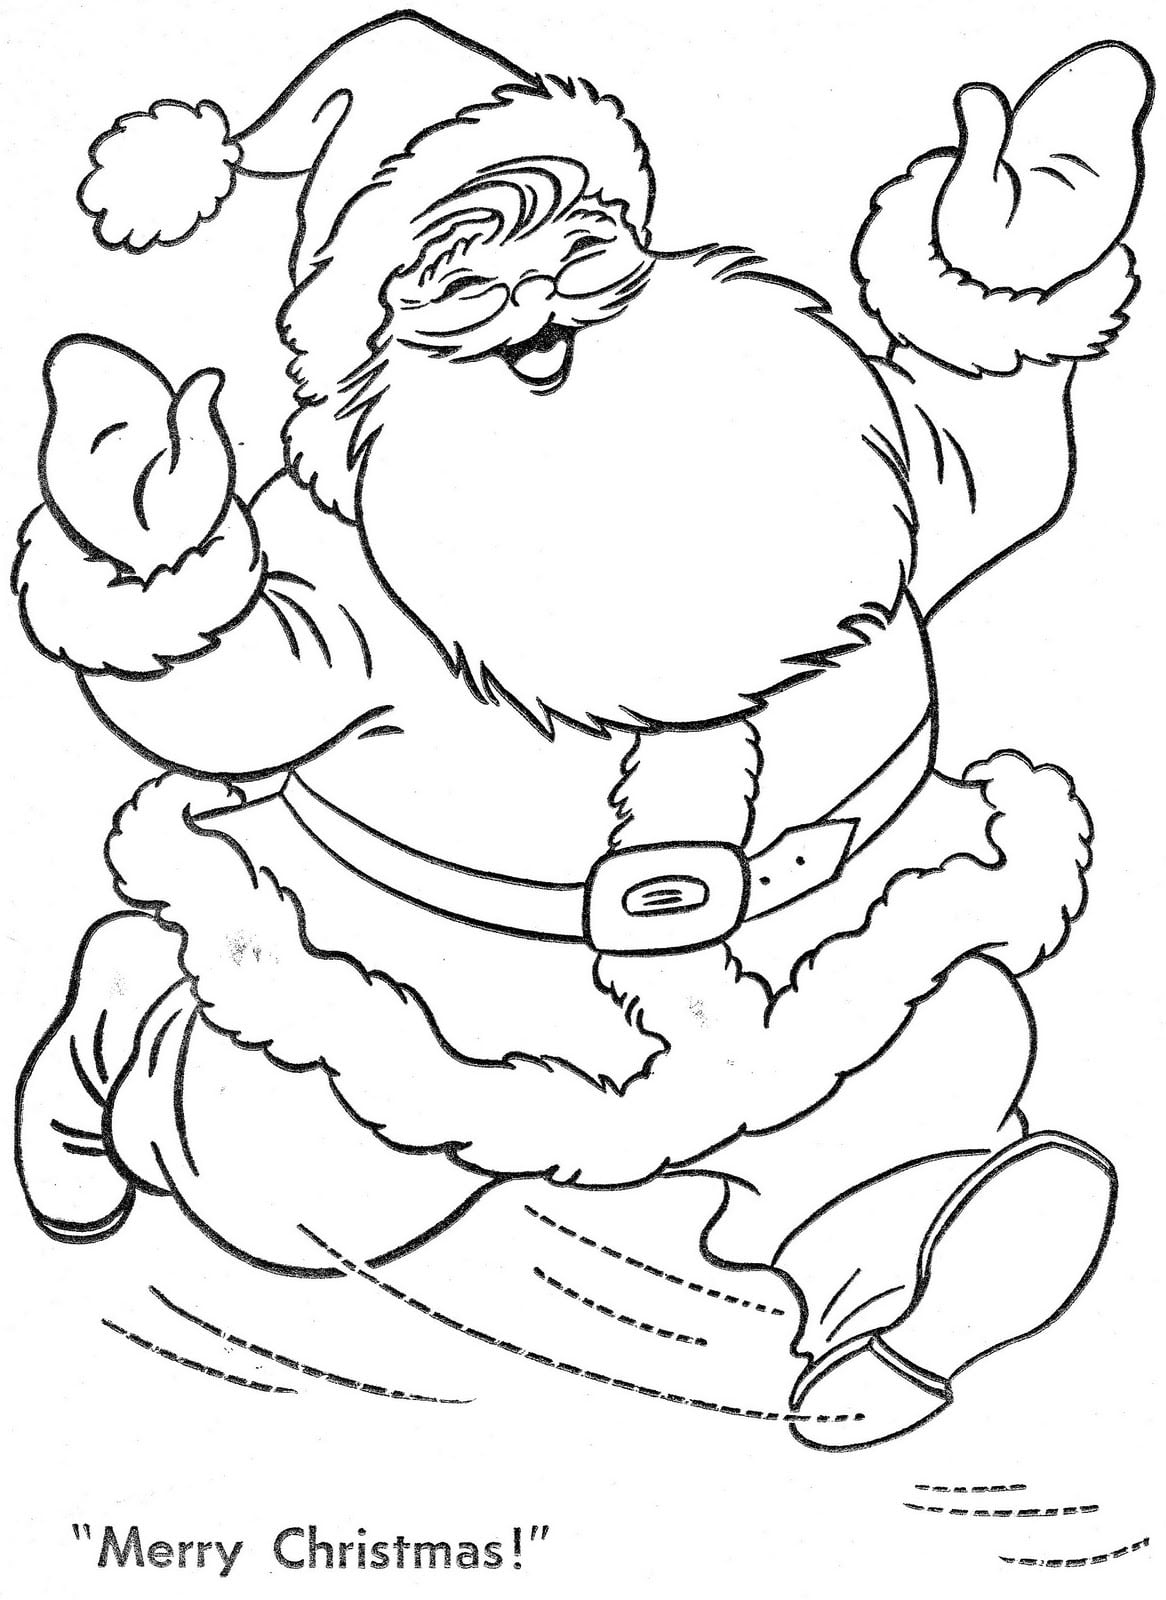 Desenho Para Colorir Do Papai Noel